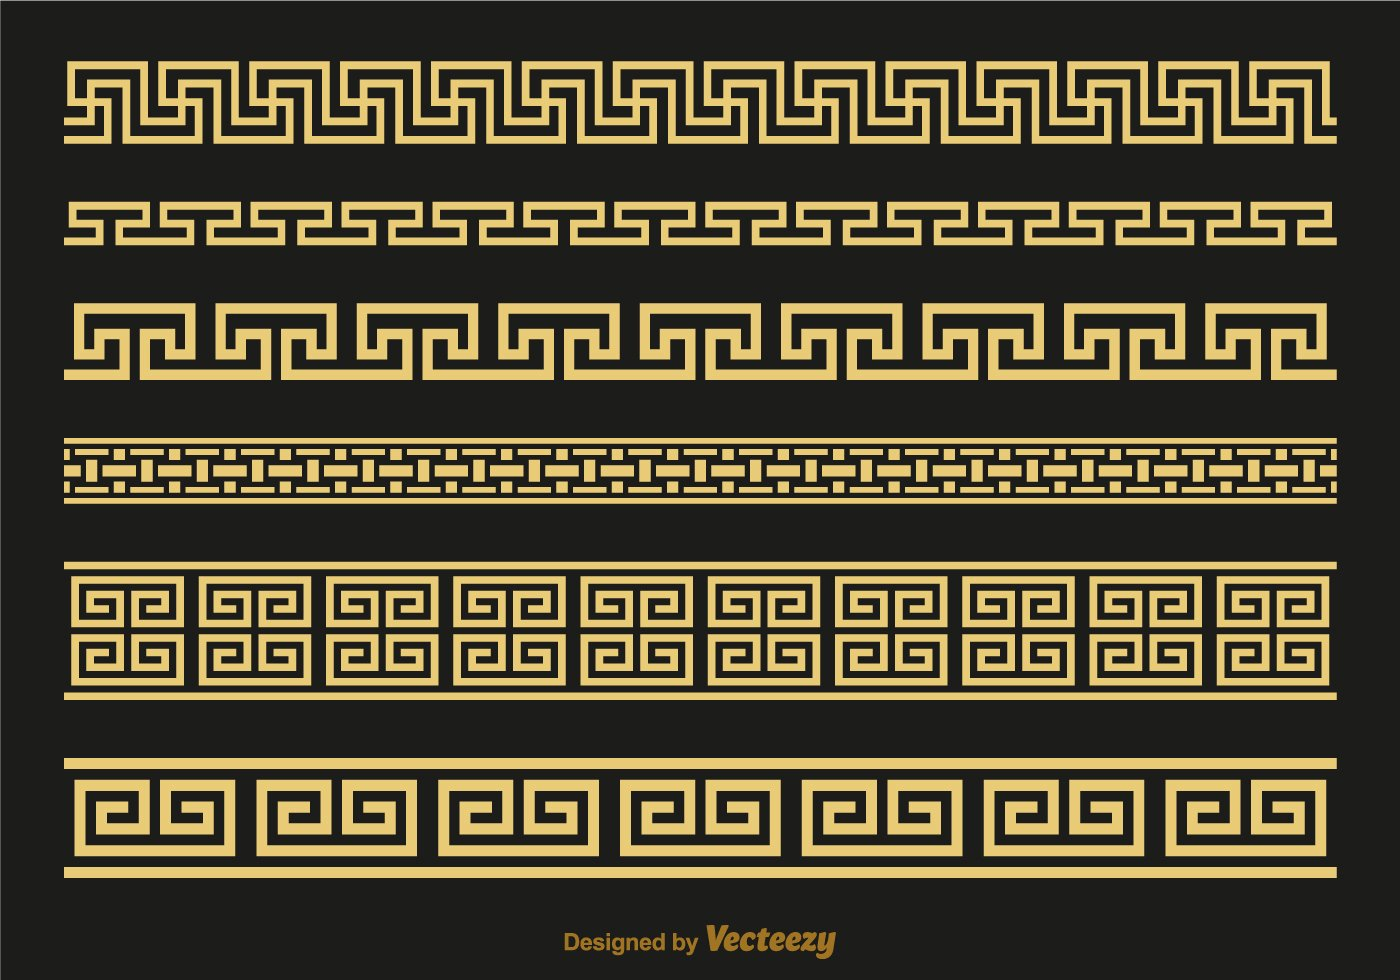 Greek Key Pattern Template Fresh Versace Greek Key Brushes Vector Download Free Vector